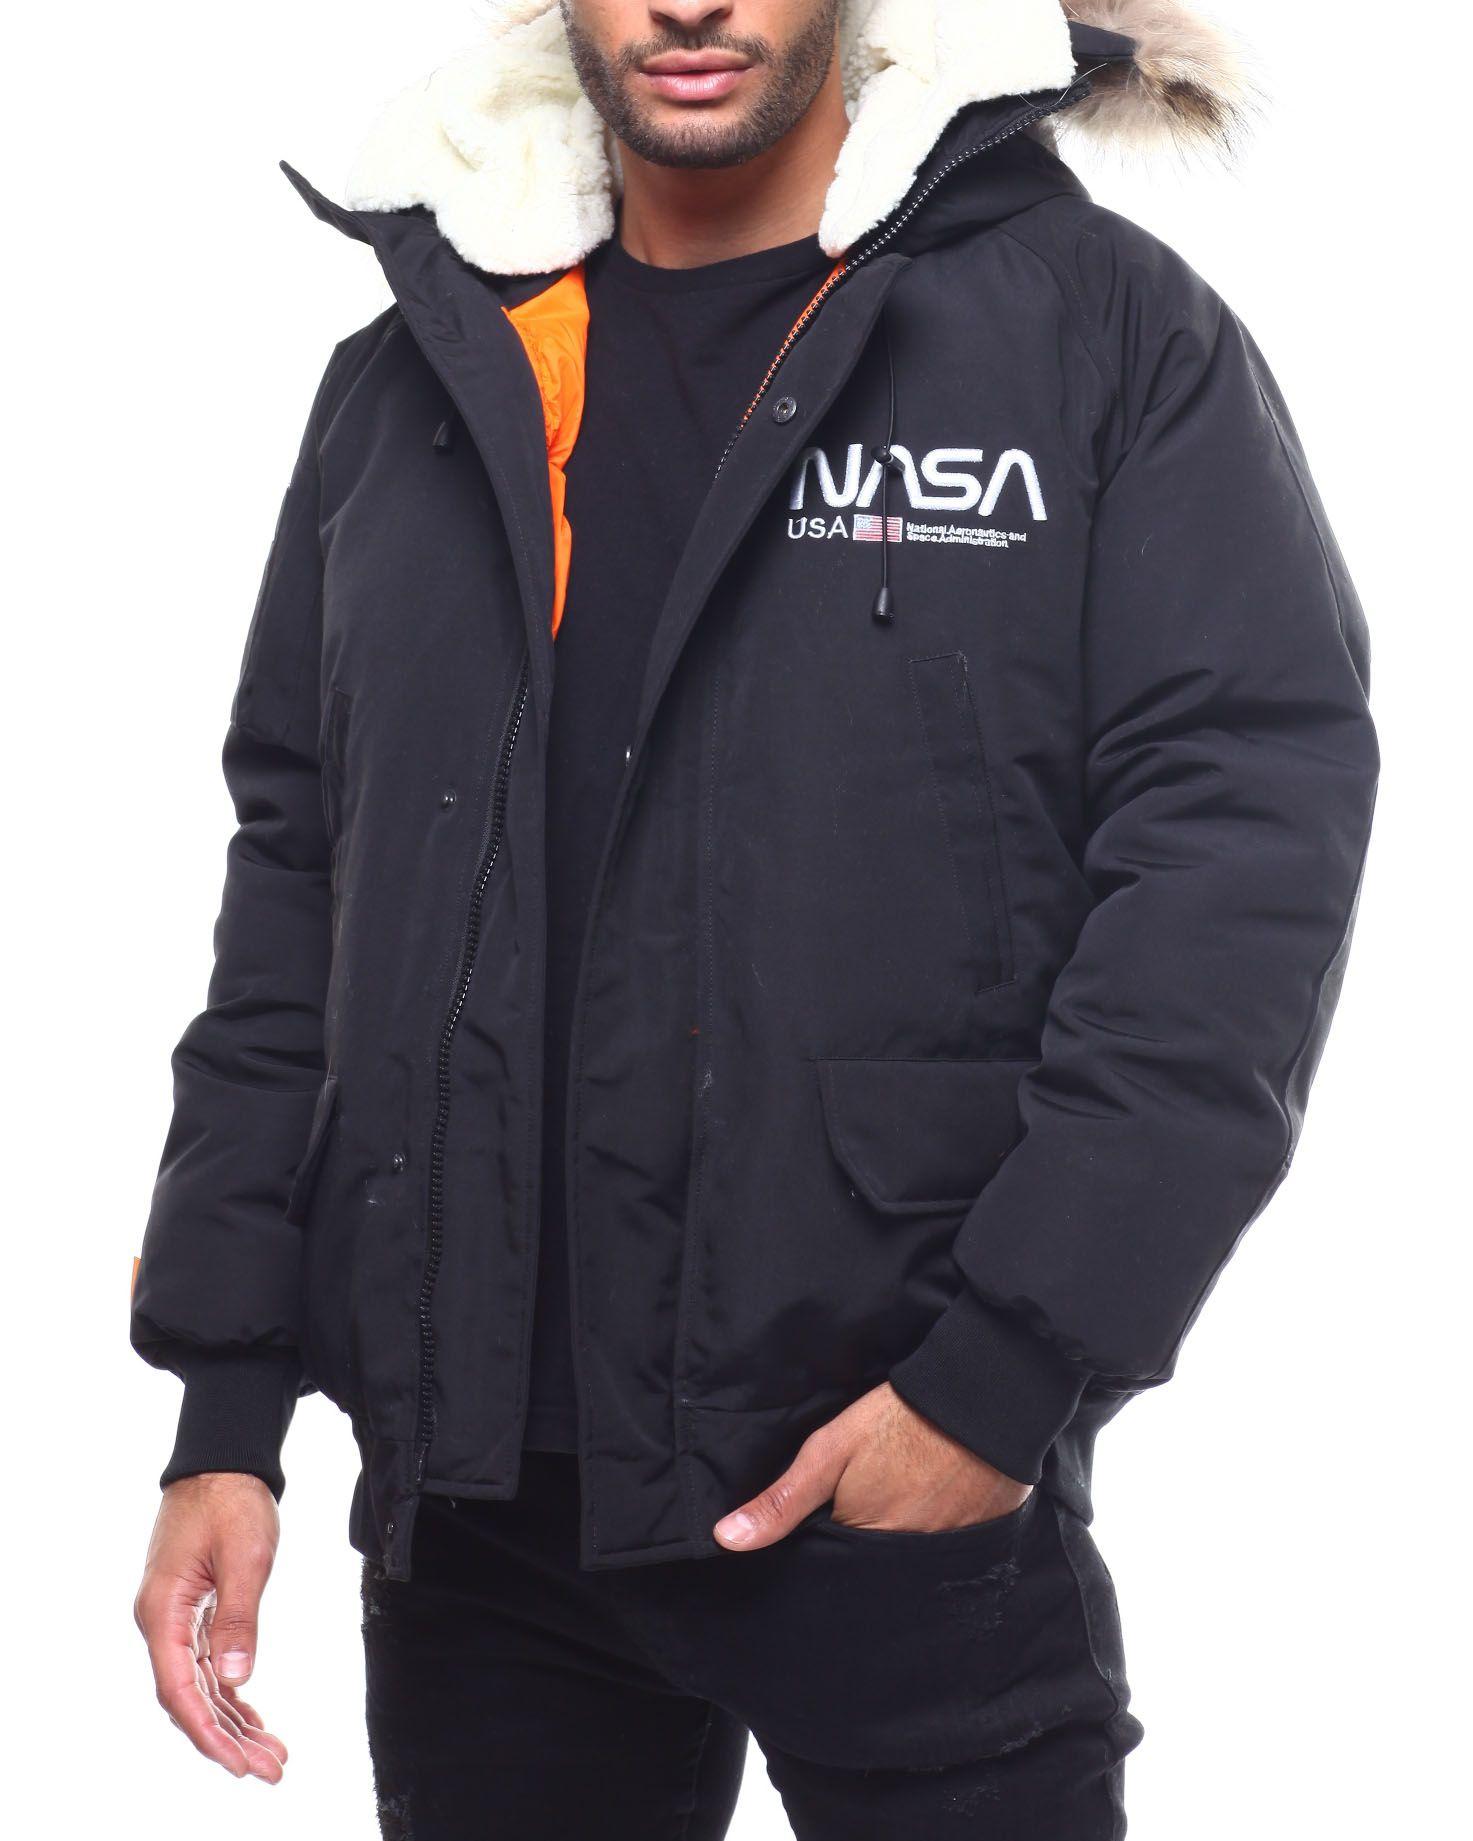 Nasa Fur Hood Bomber Jacket From Hudson Nyc At Drjays Com Nasa Jacket Dapper Men Jackets [ 1841 x 1473 Pixel ]